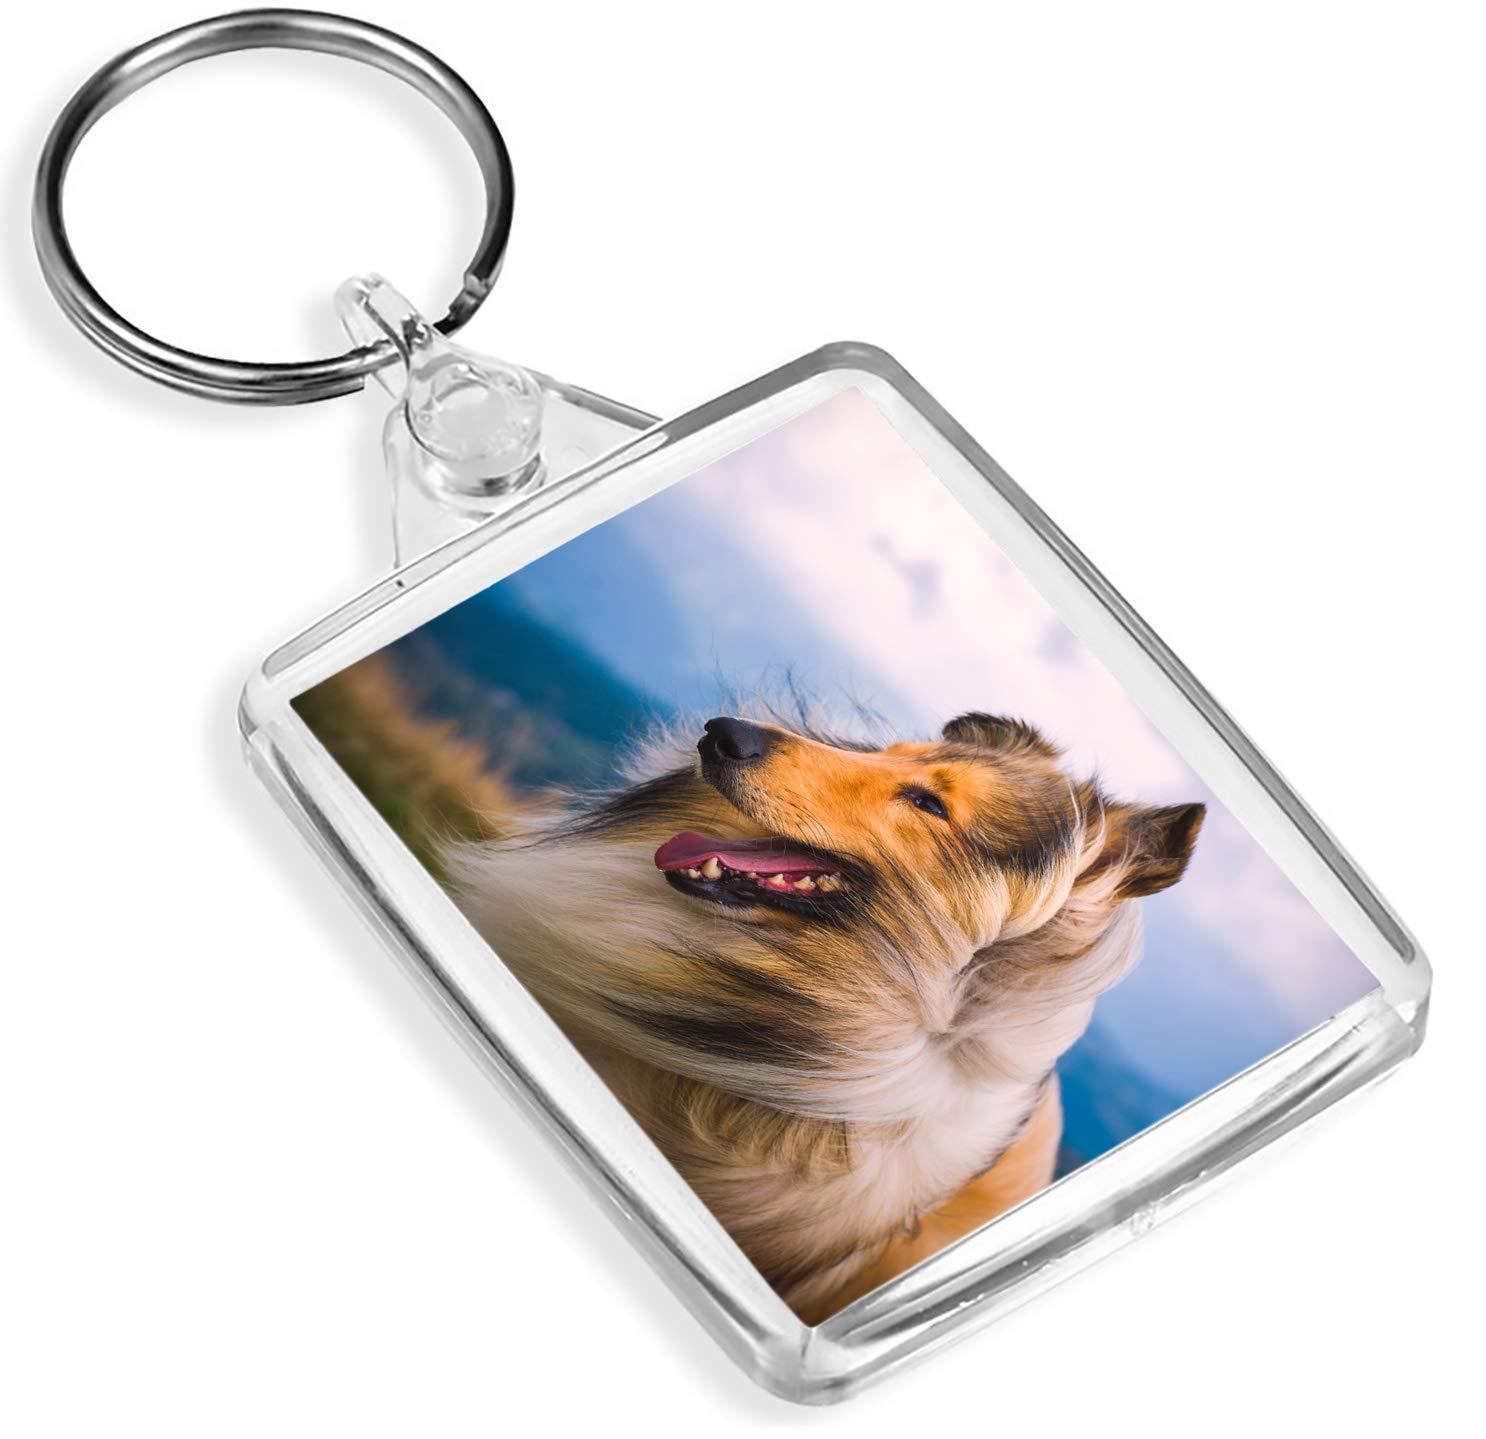 Beautiful Rough Collie Keyring IP02 Sheep Dog Puppy Cool Farm Gift #8615